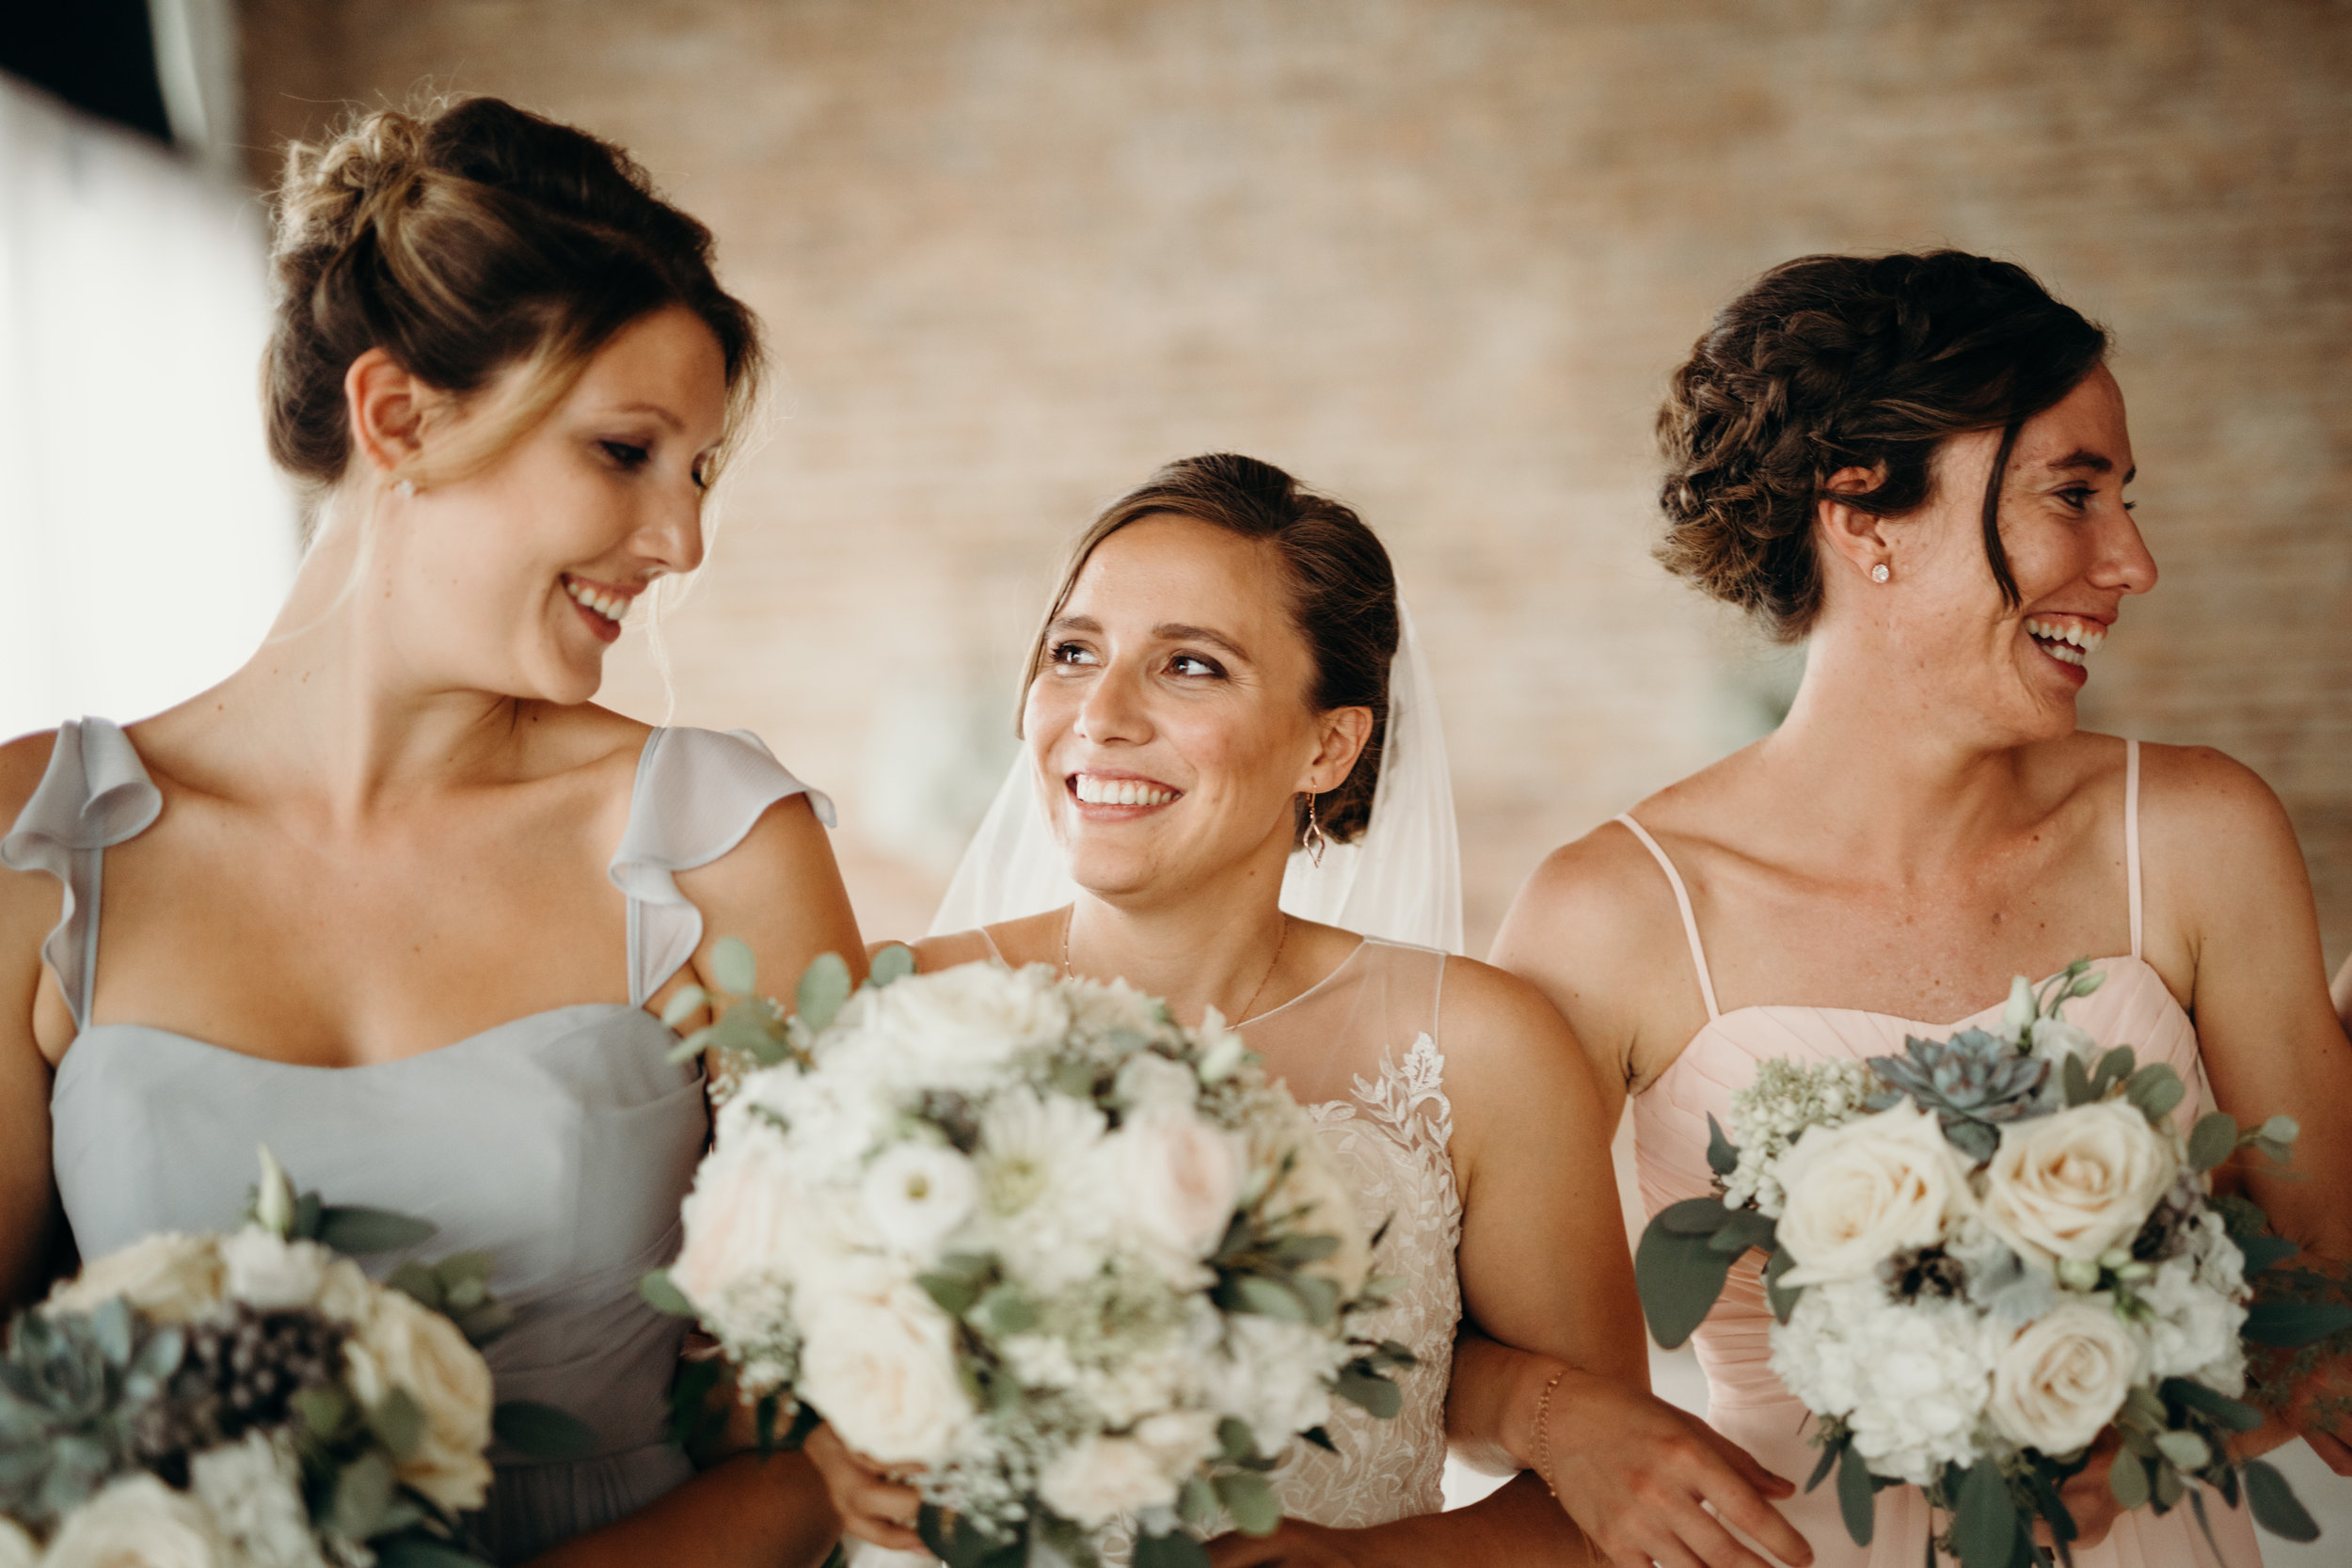 Vintage Wedding_Polly C Photography_20171726175737.jpg